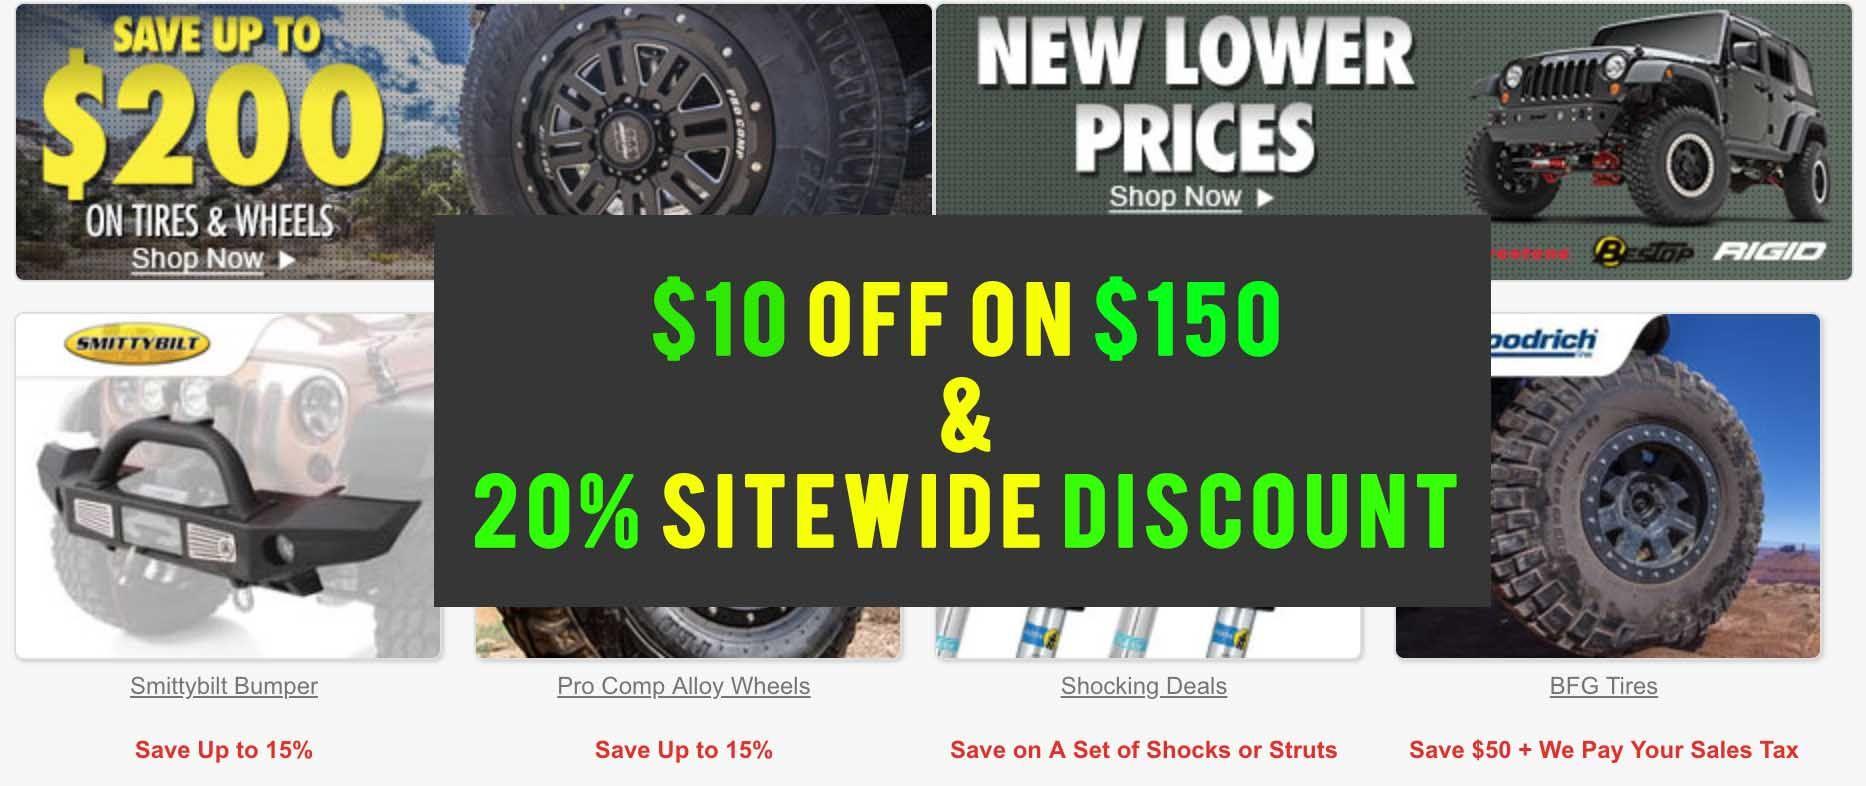 4 Wheel Parts Promo Code 4wheelparts Auto Coupon Discount Promo Codes Coding Coupons